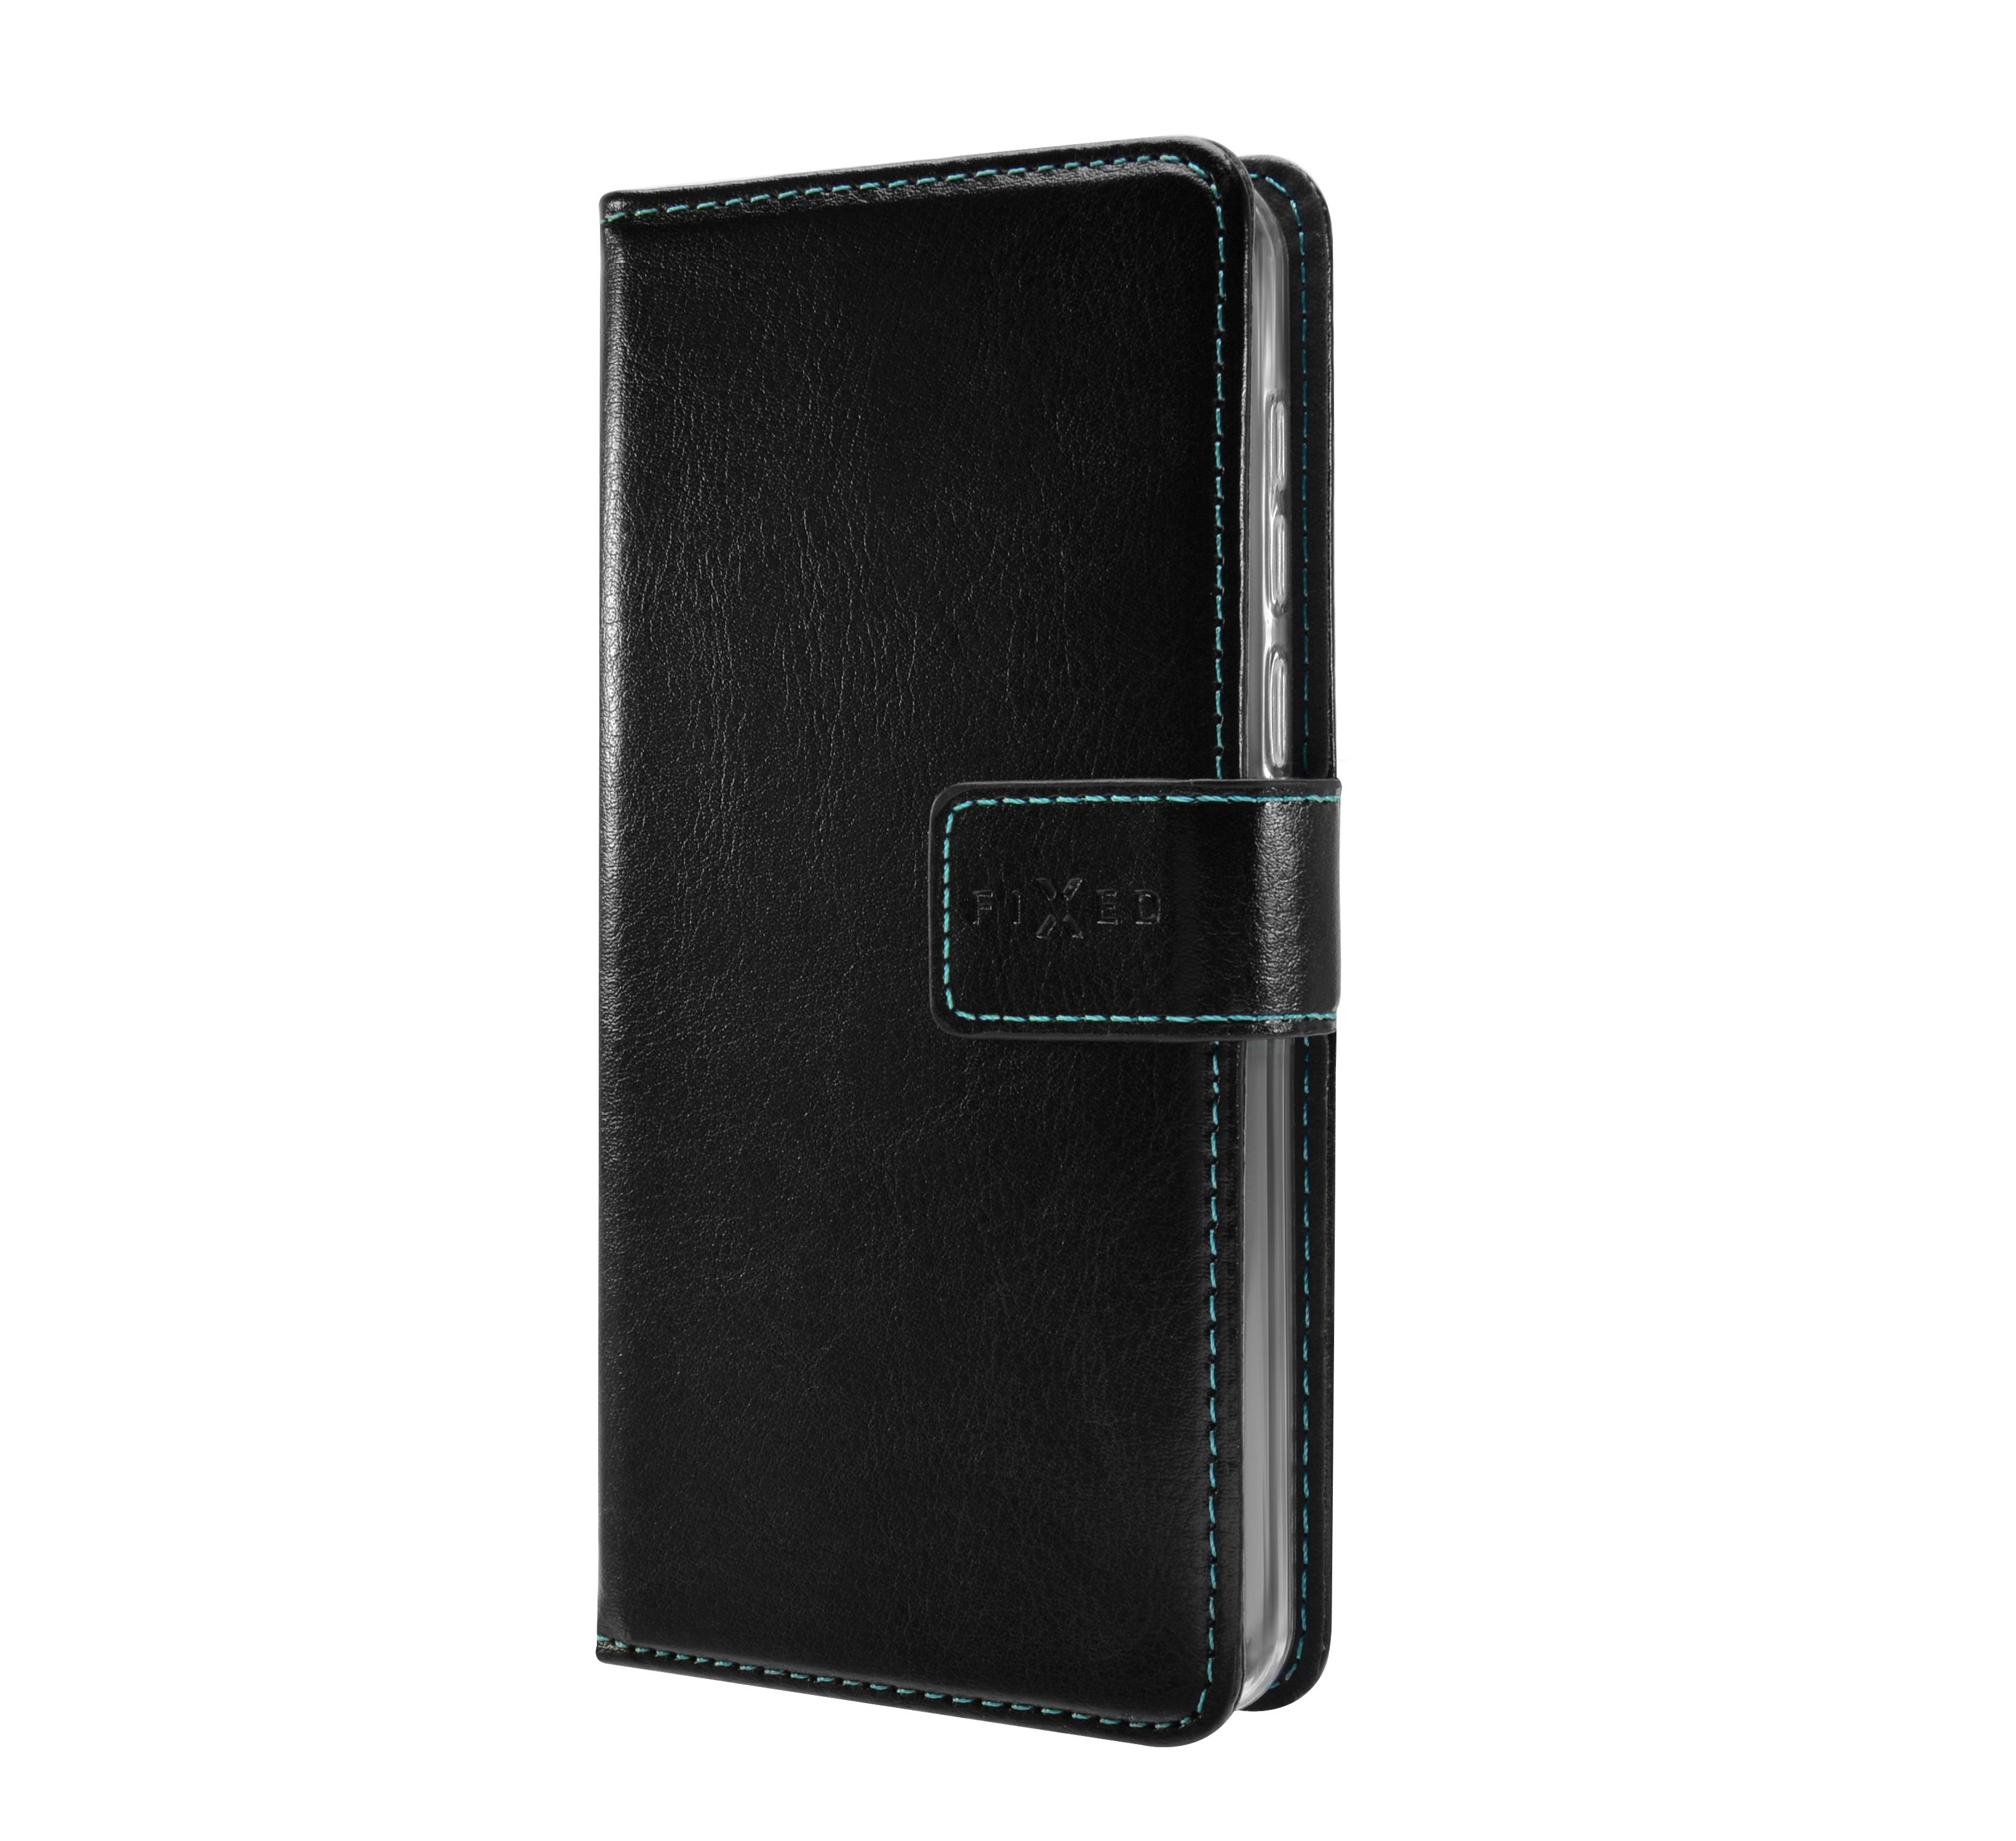 Pouzdro typu kniha FIXED Opus pro Huawei Mate 20 Lite, černé